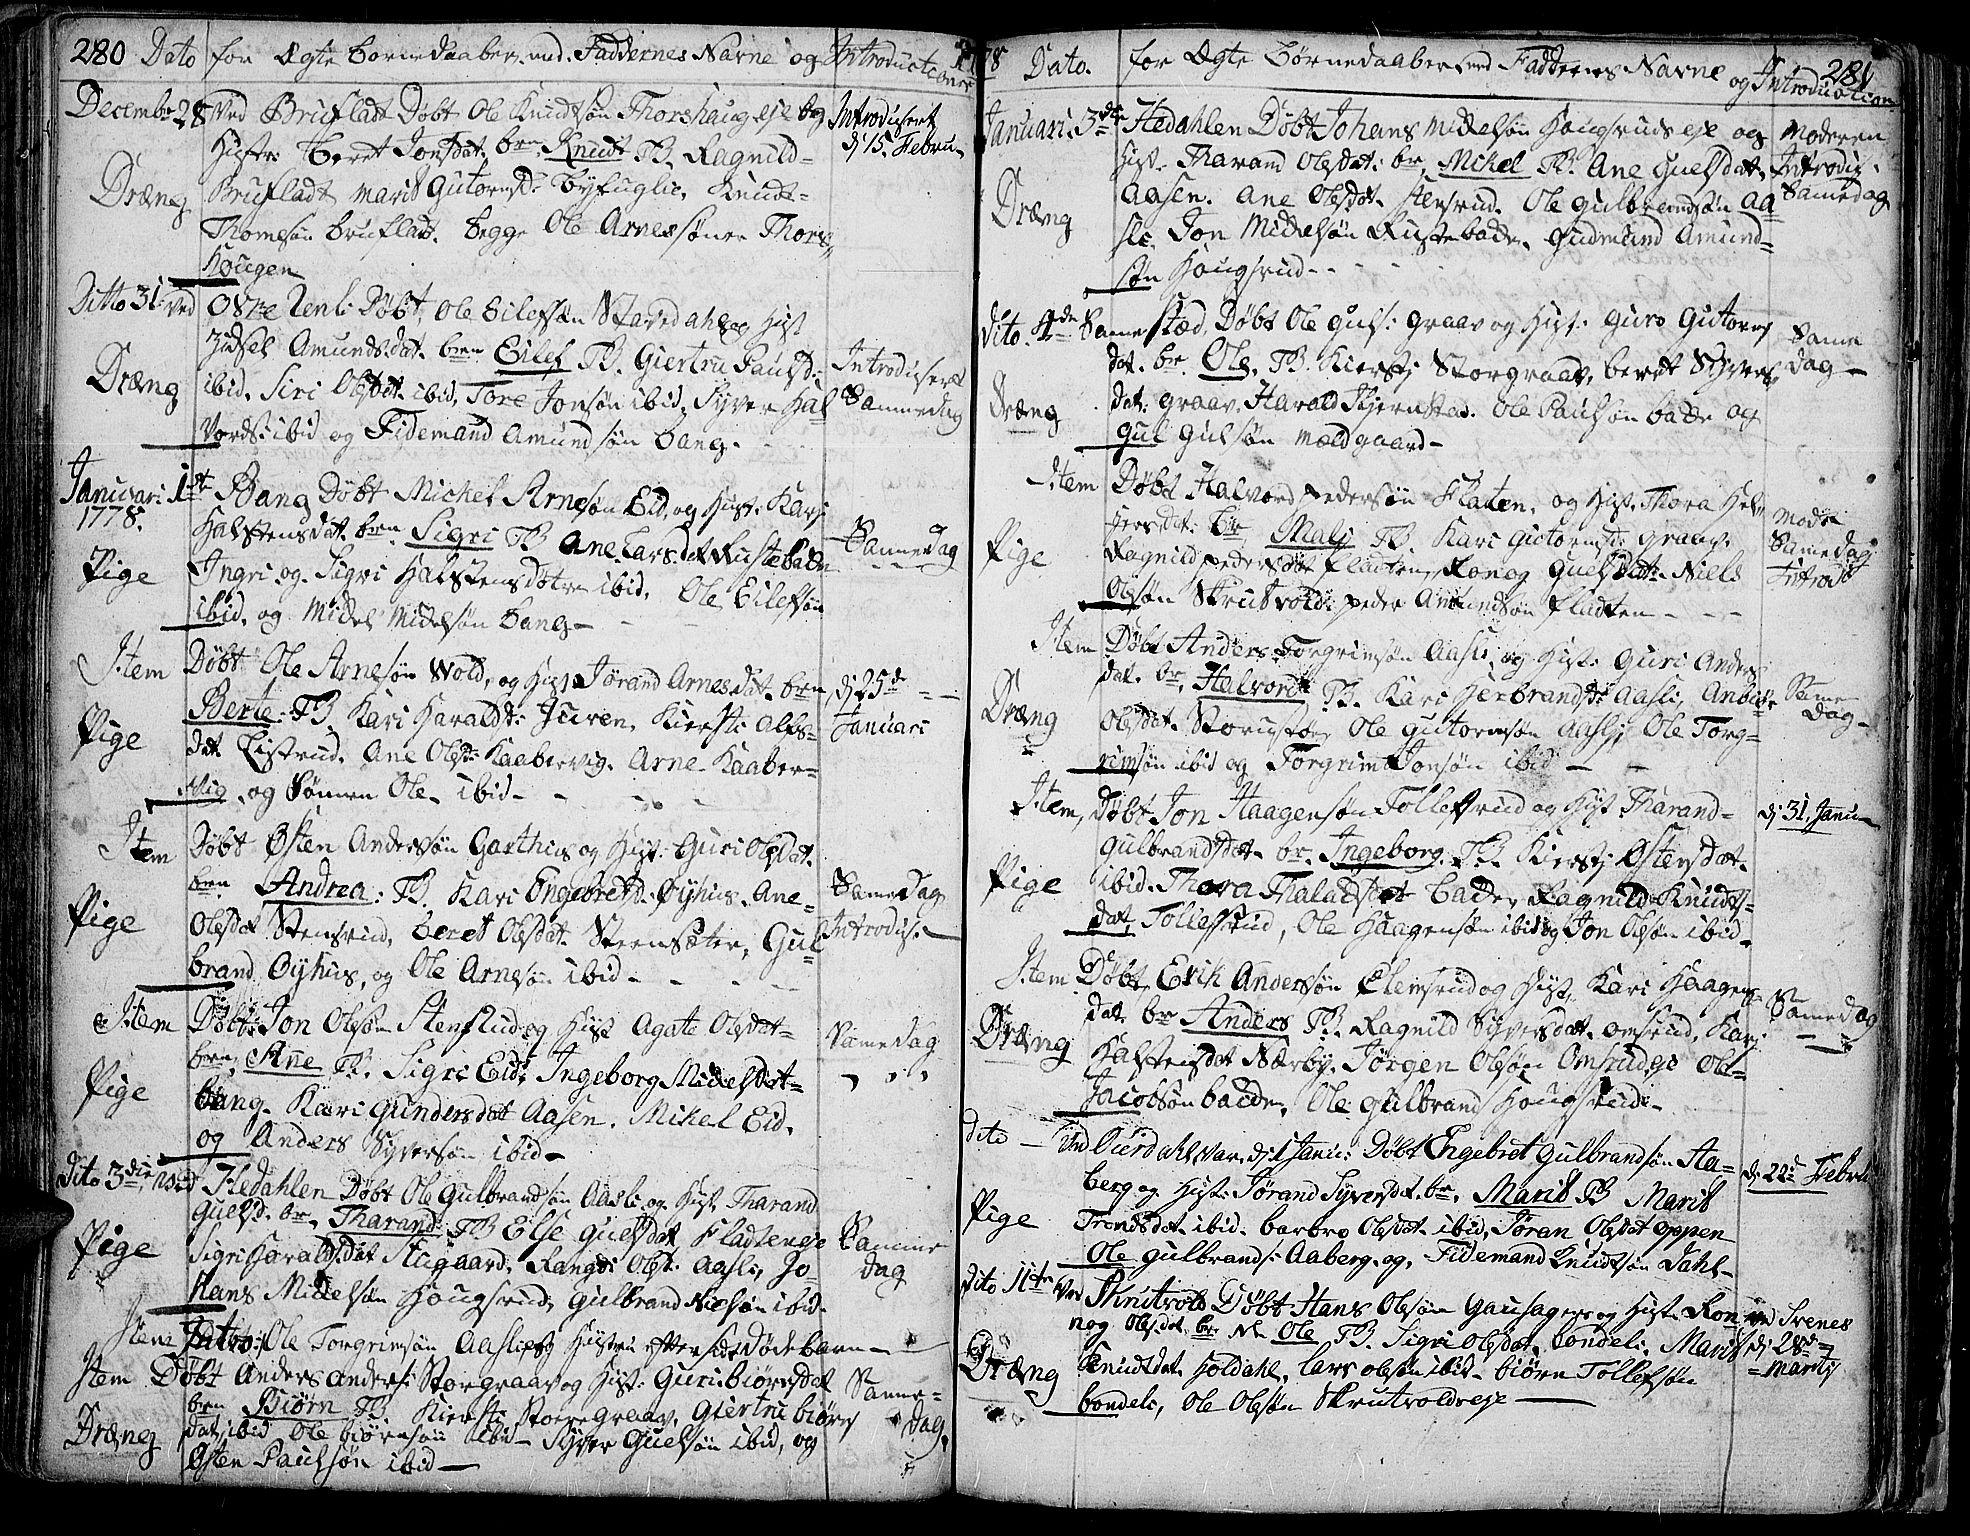 SAH, Aurdal prestekontor, Ministerialbok nr. 5, 1763-1781, s. 280-281